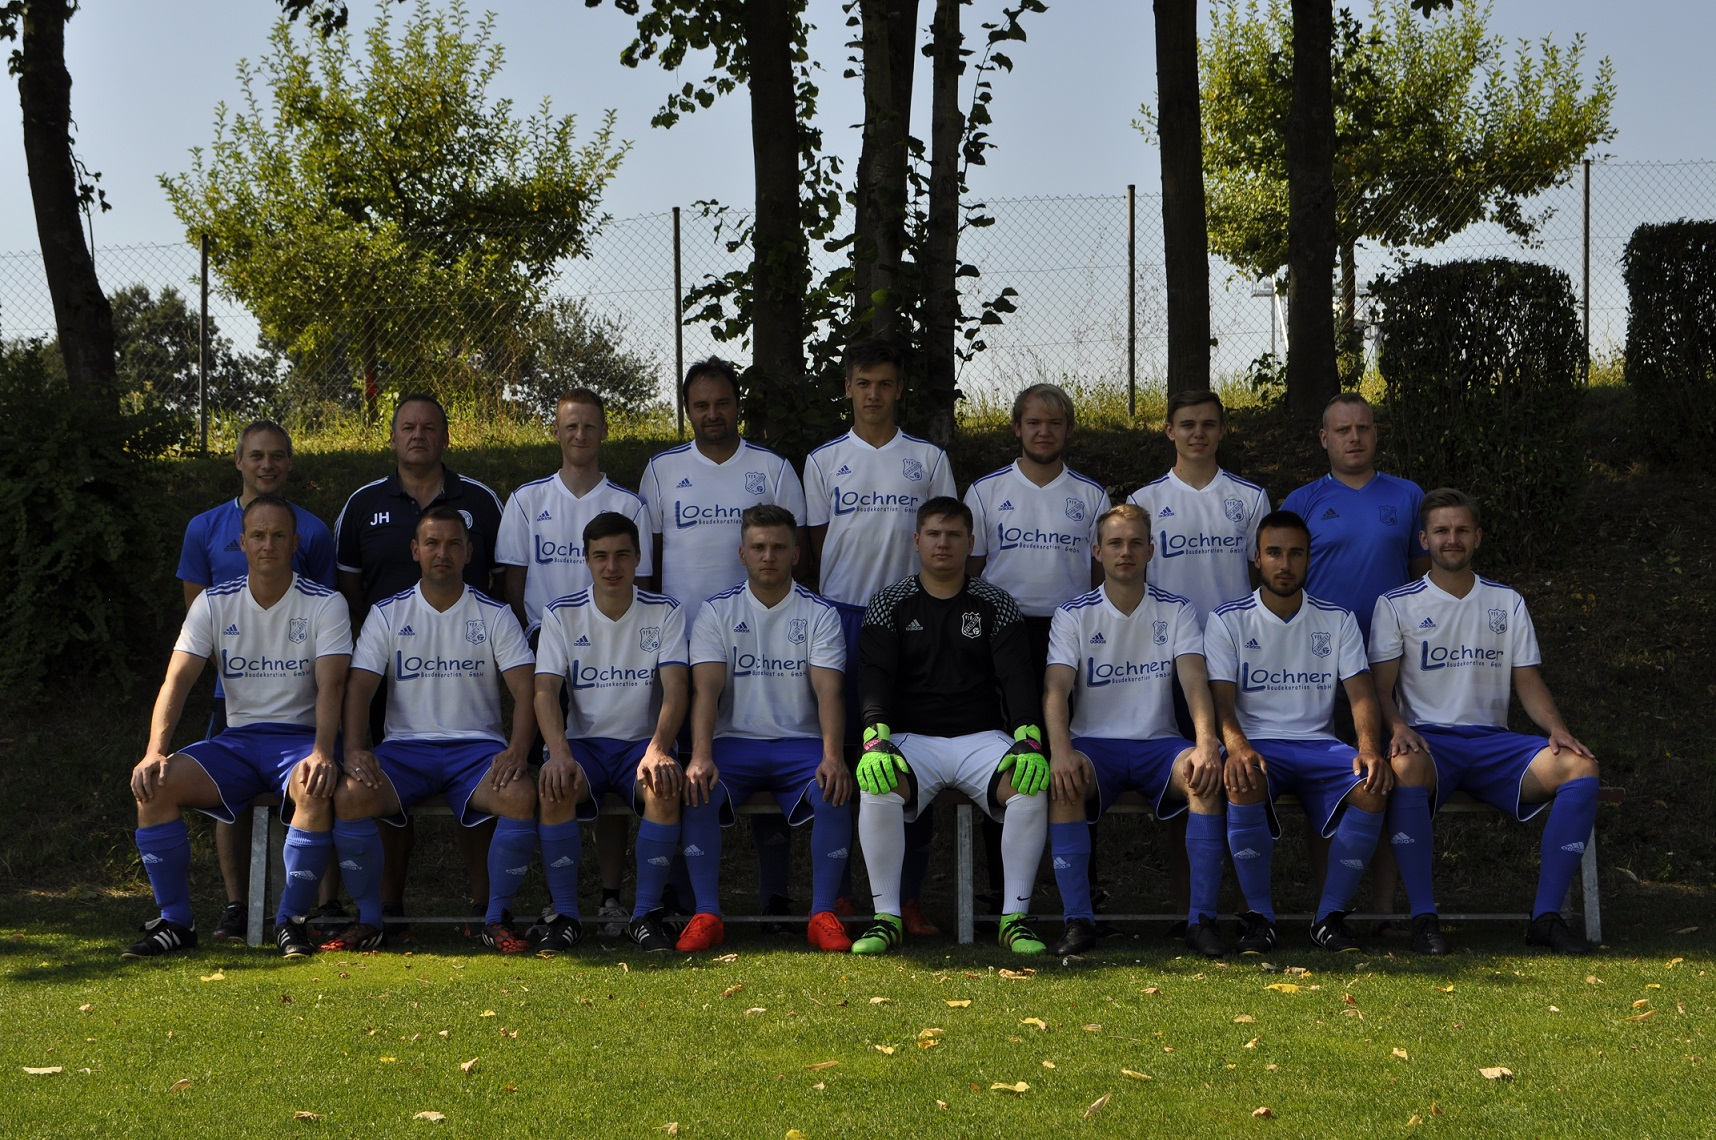 2. Mannschaft VfB Burglauer